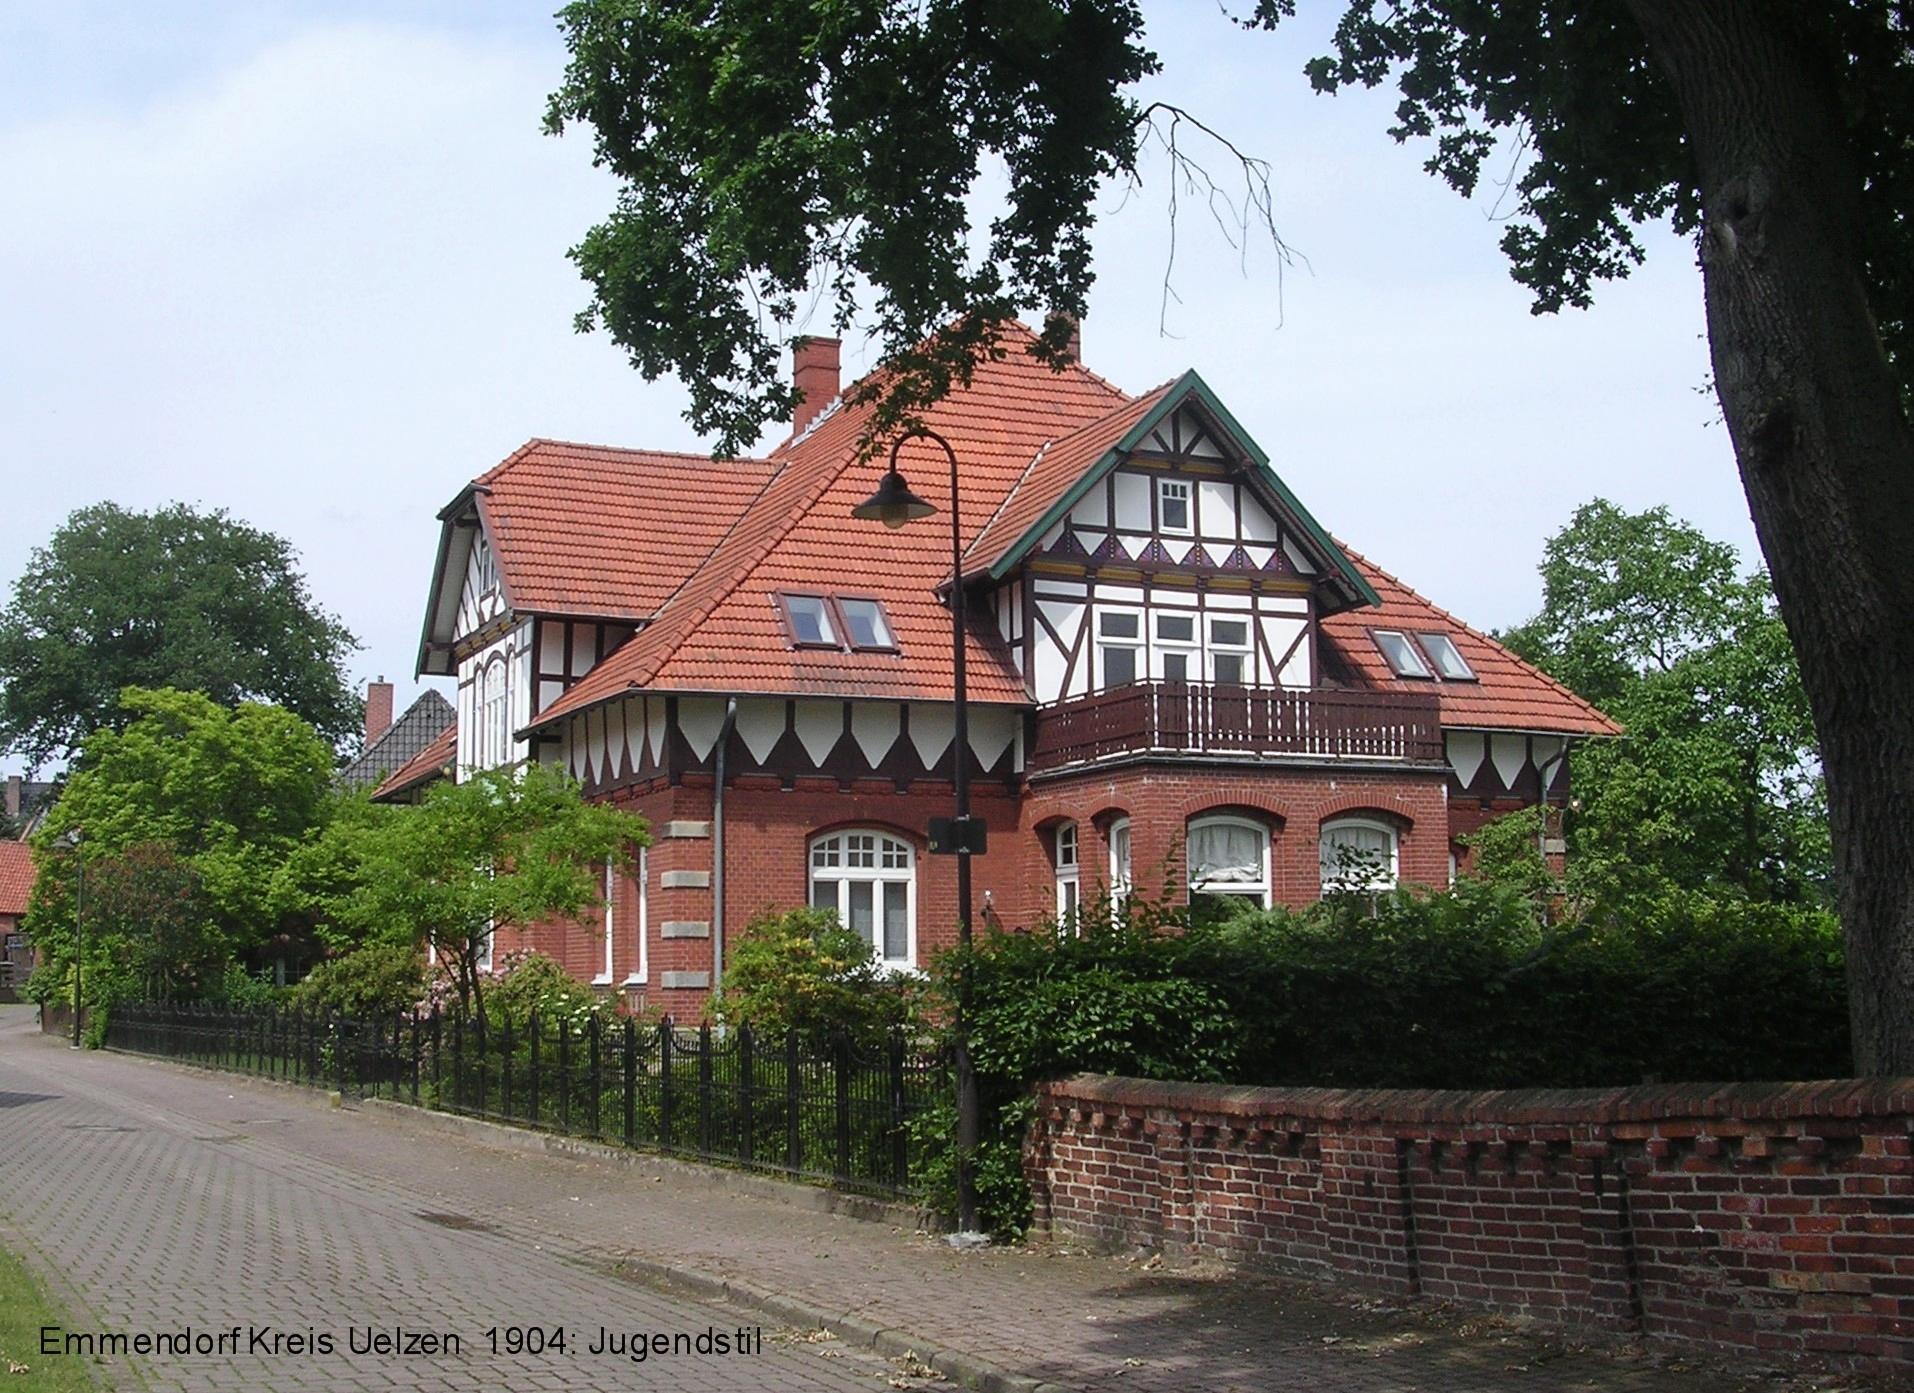 h-emmendorf-ur-1904-